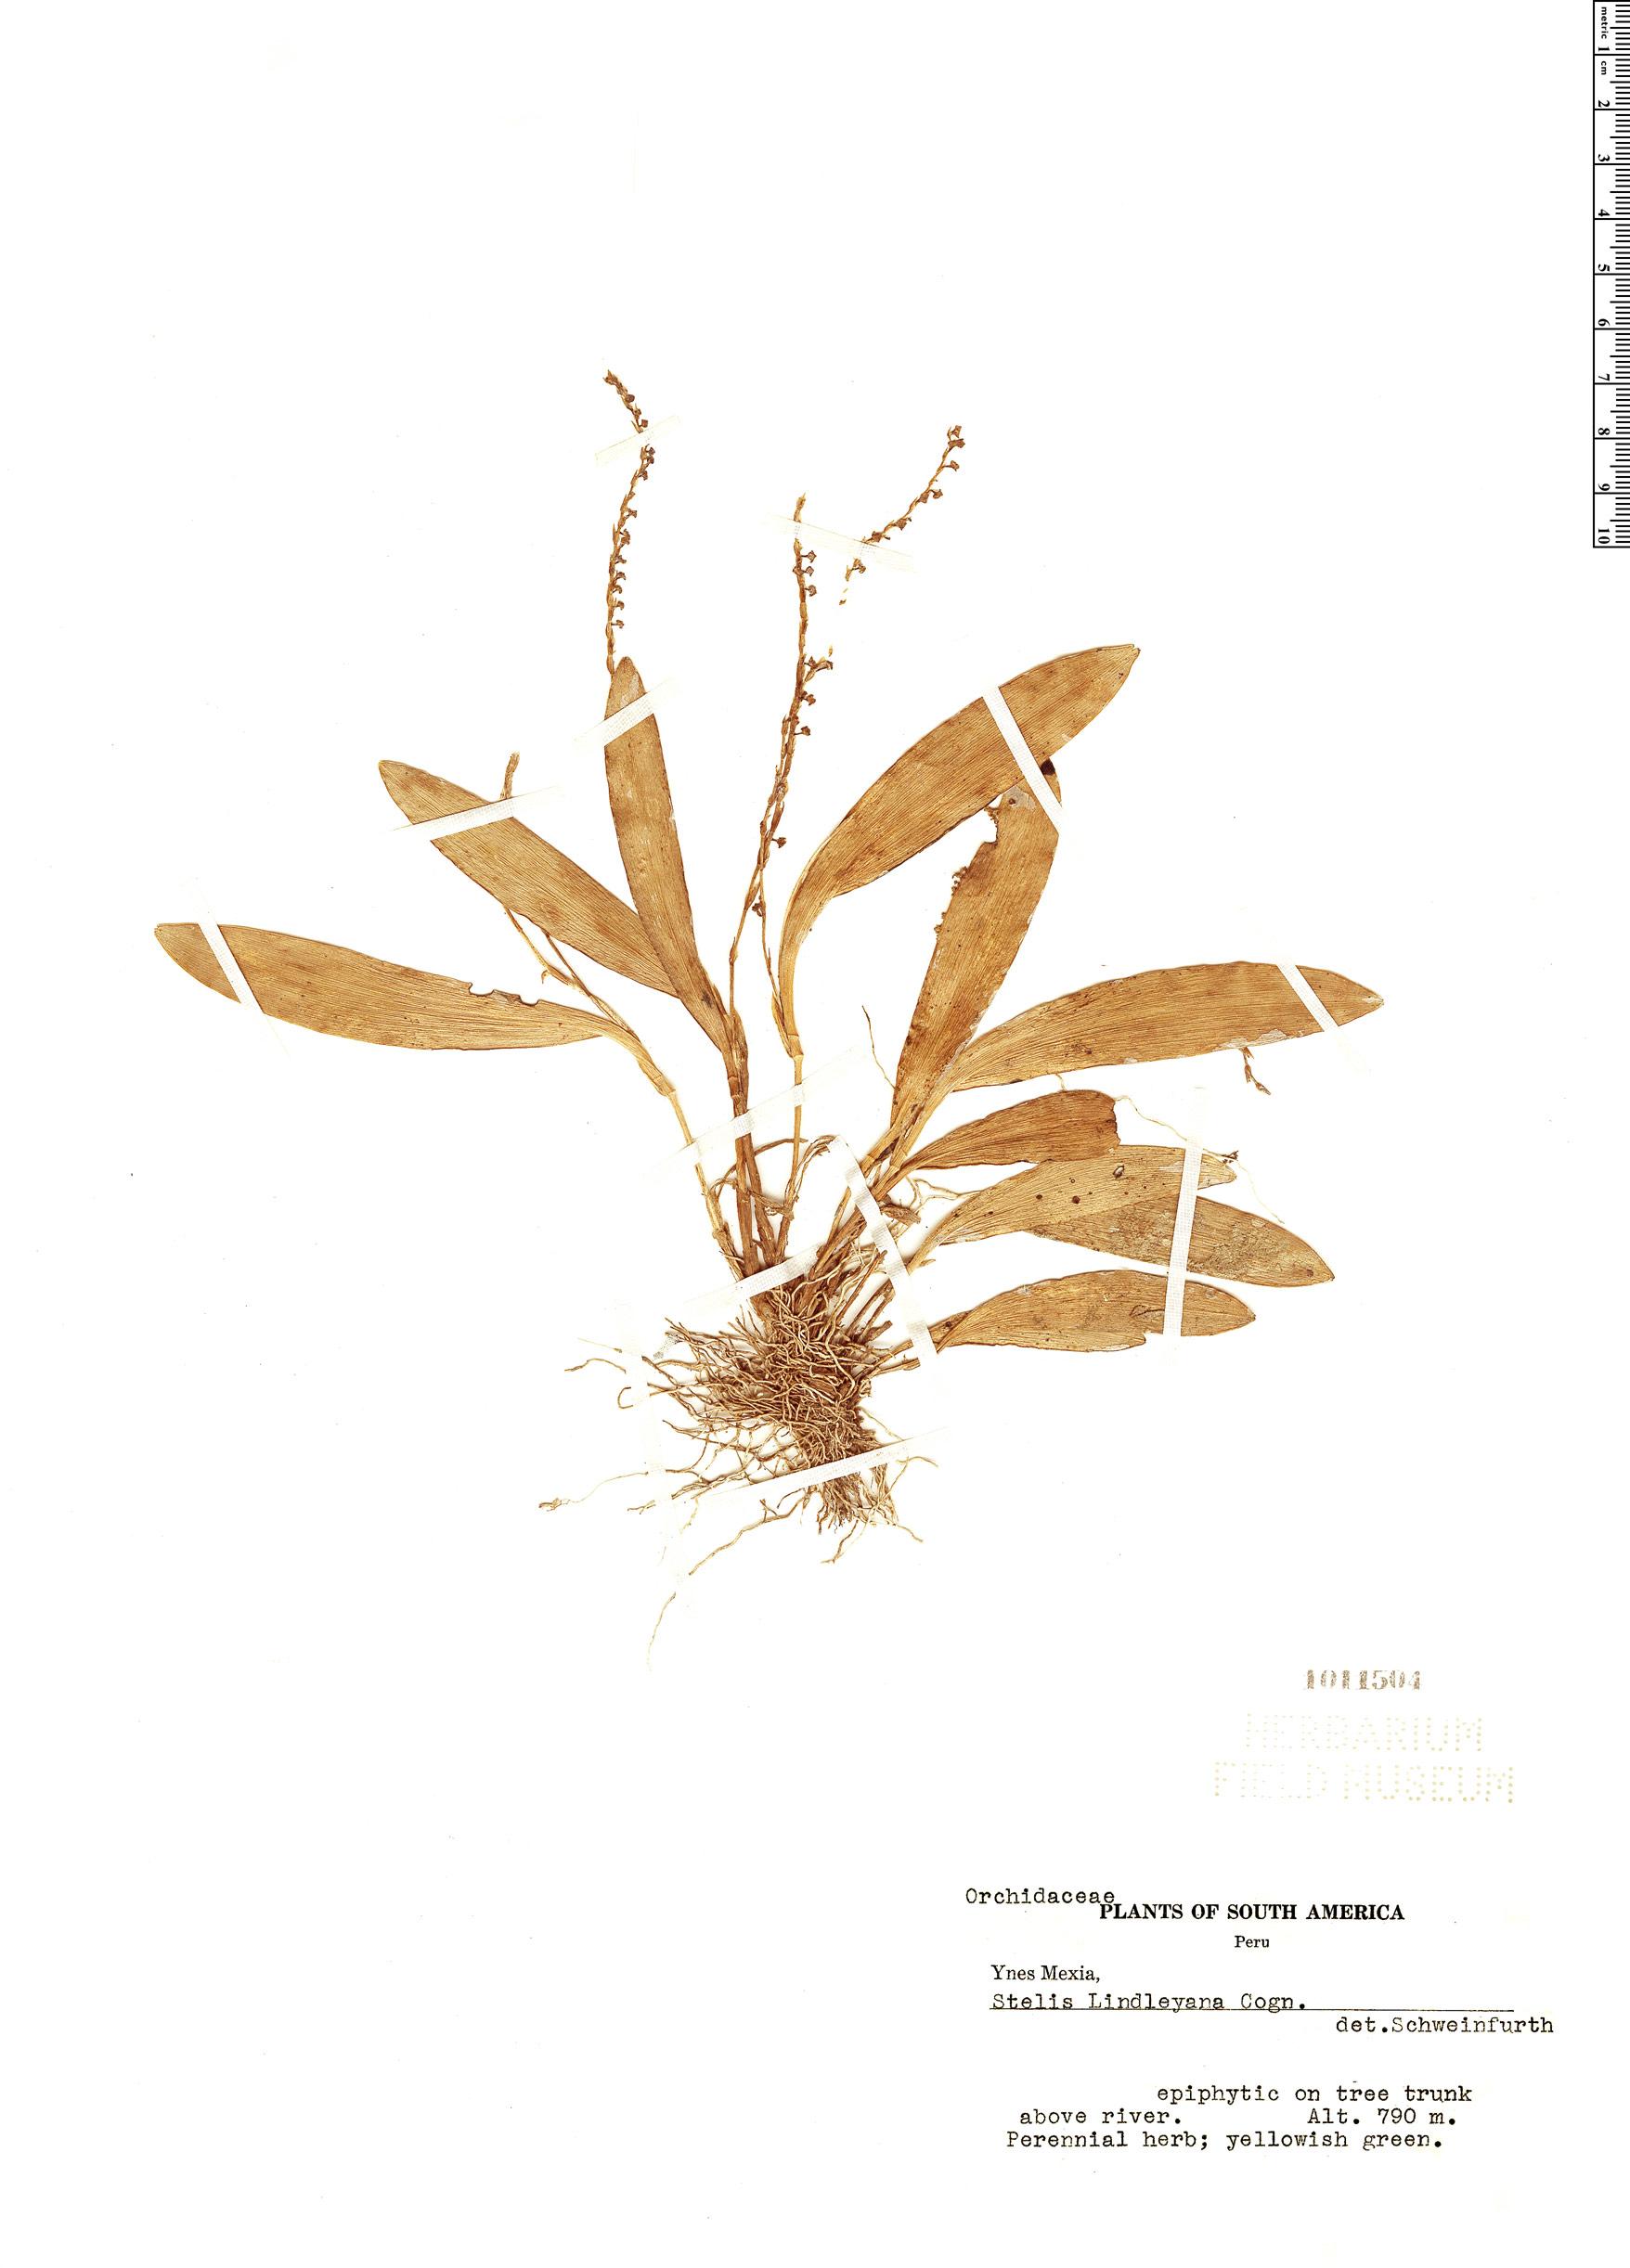 Specimen: Stelis lindleyana